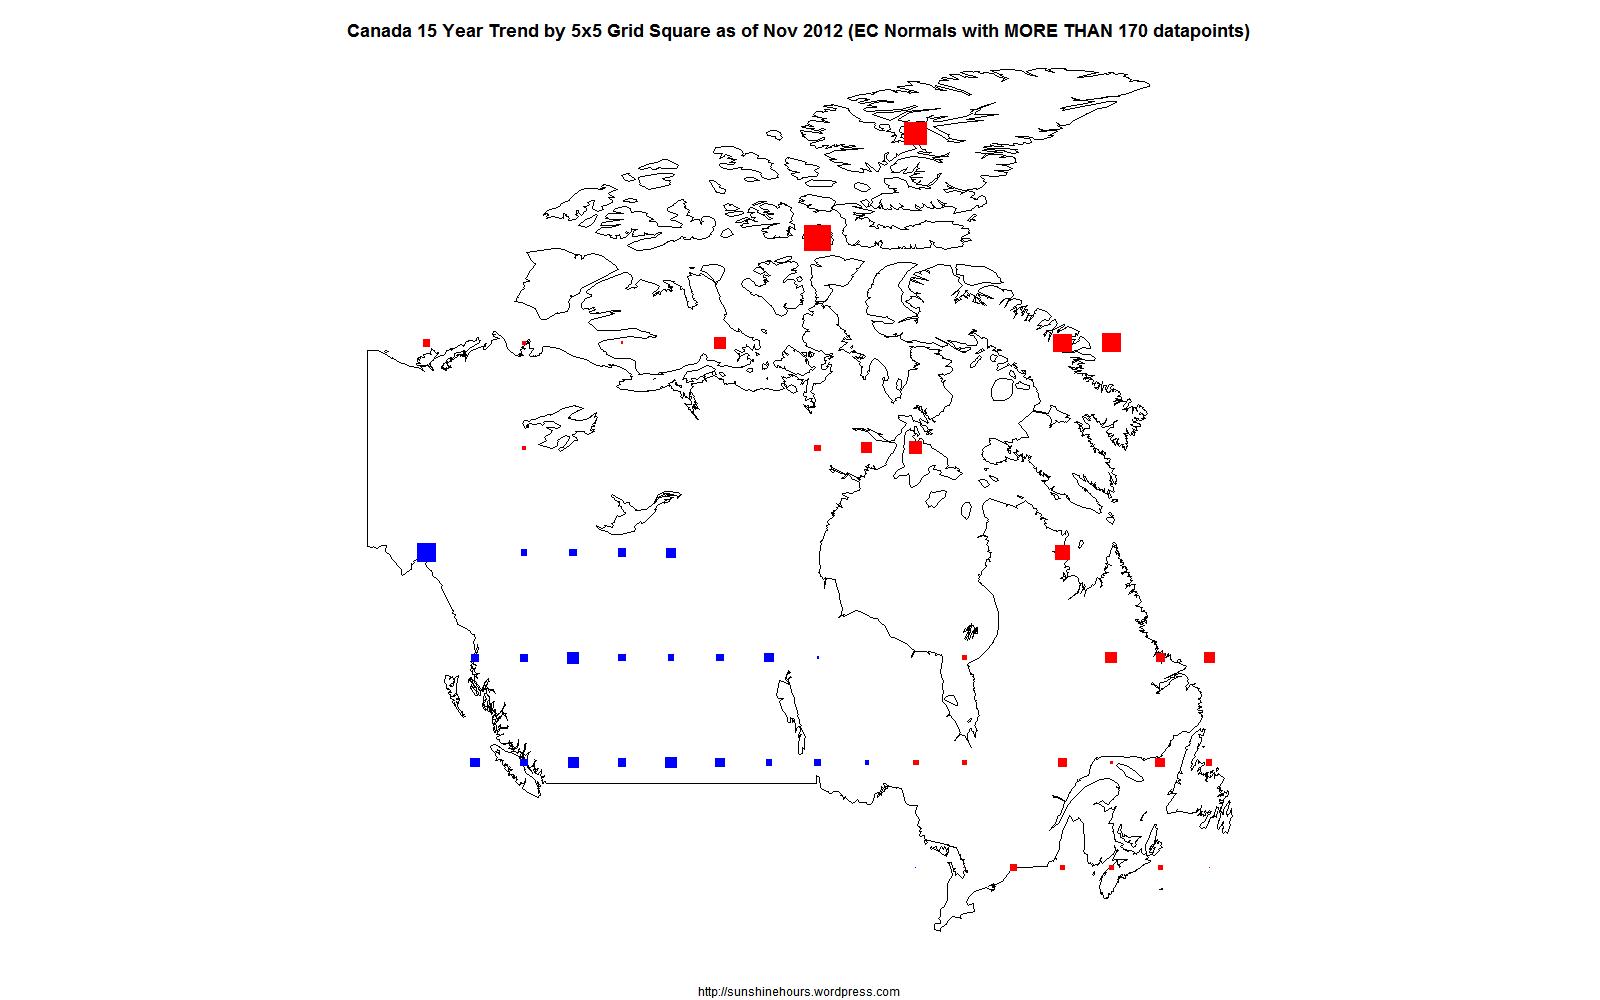 Canada Nov 2012 15 Year Trend by 5×5 Grid Square